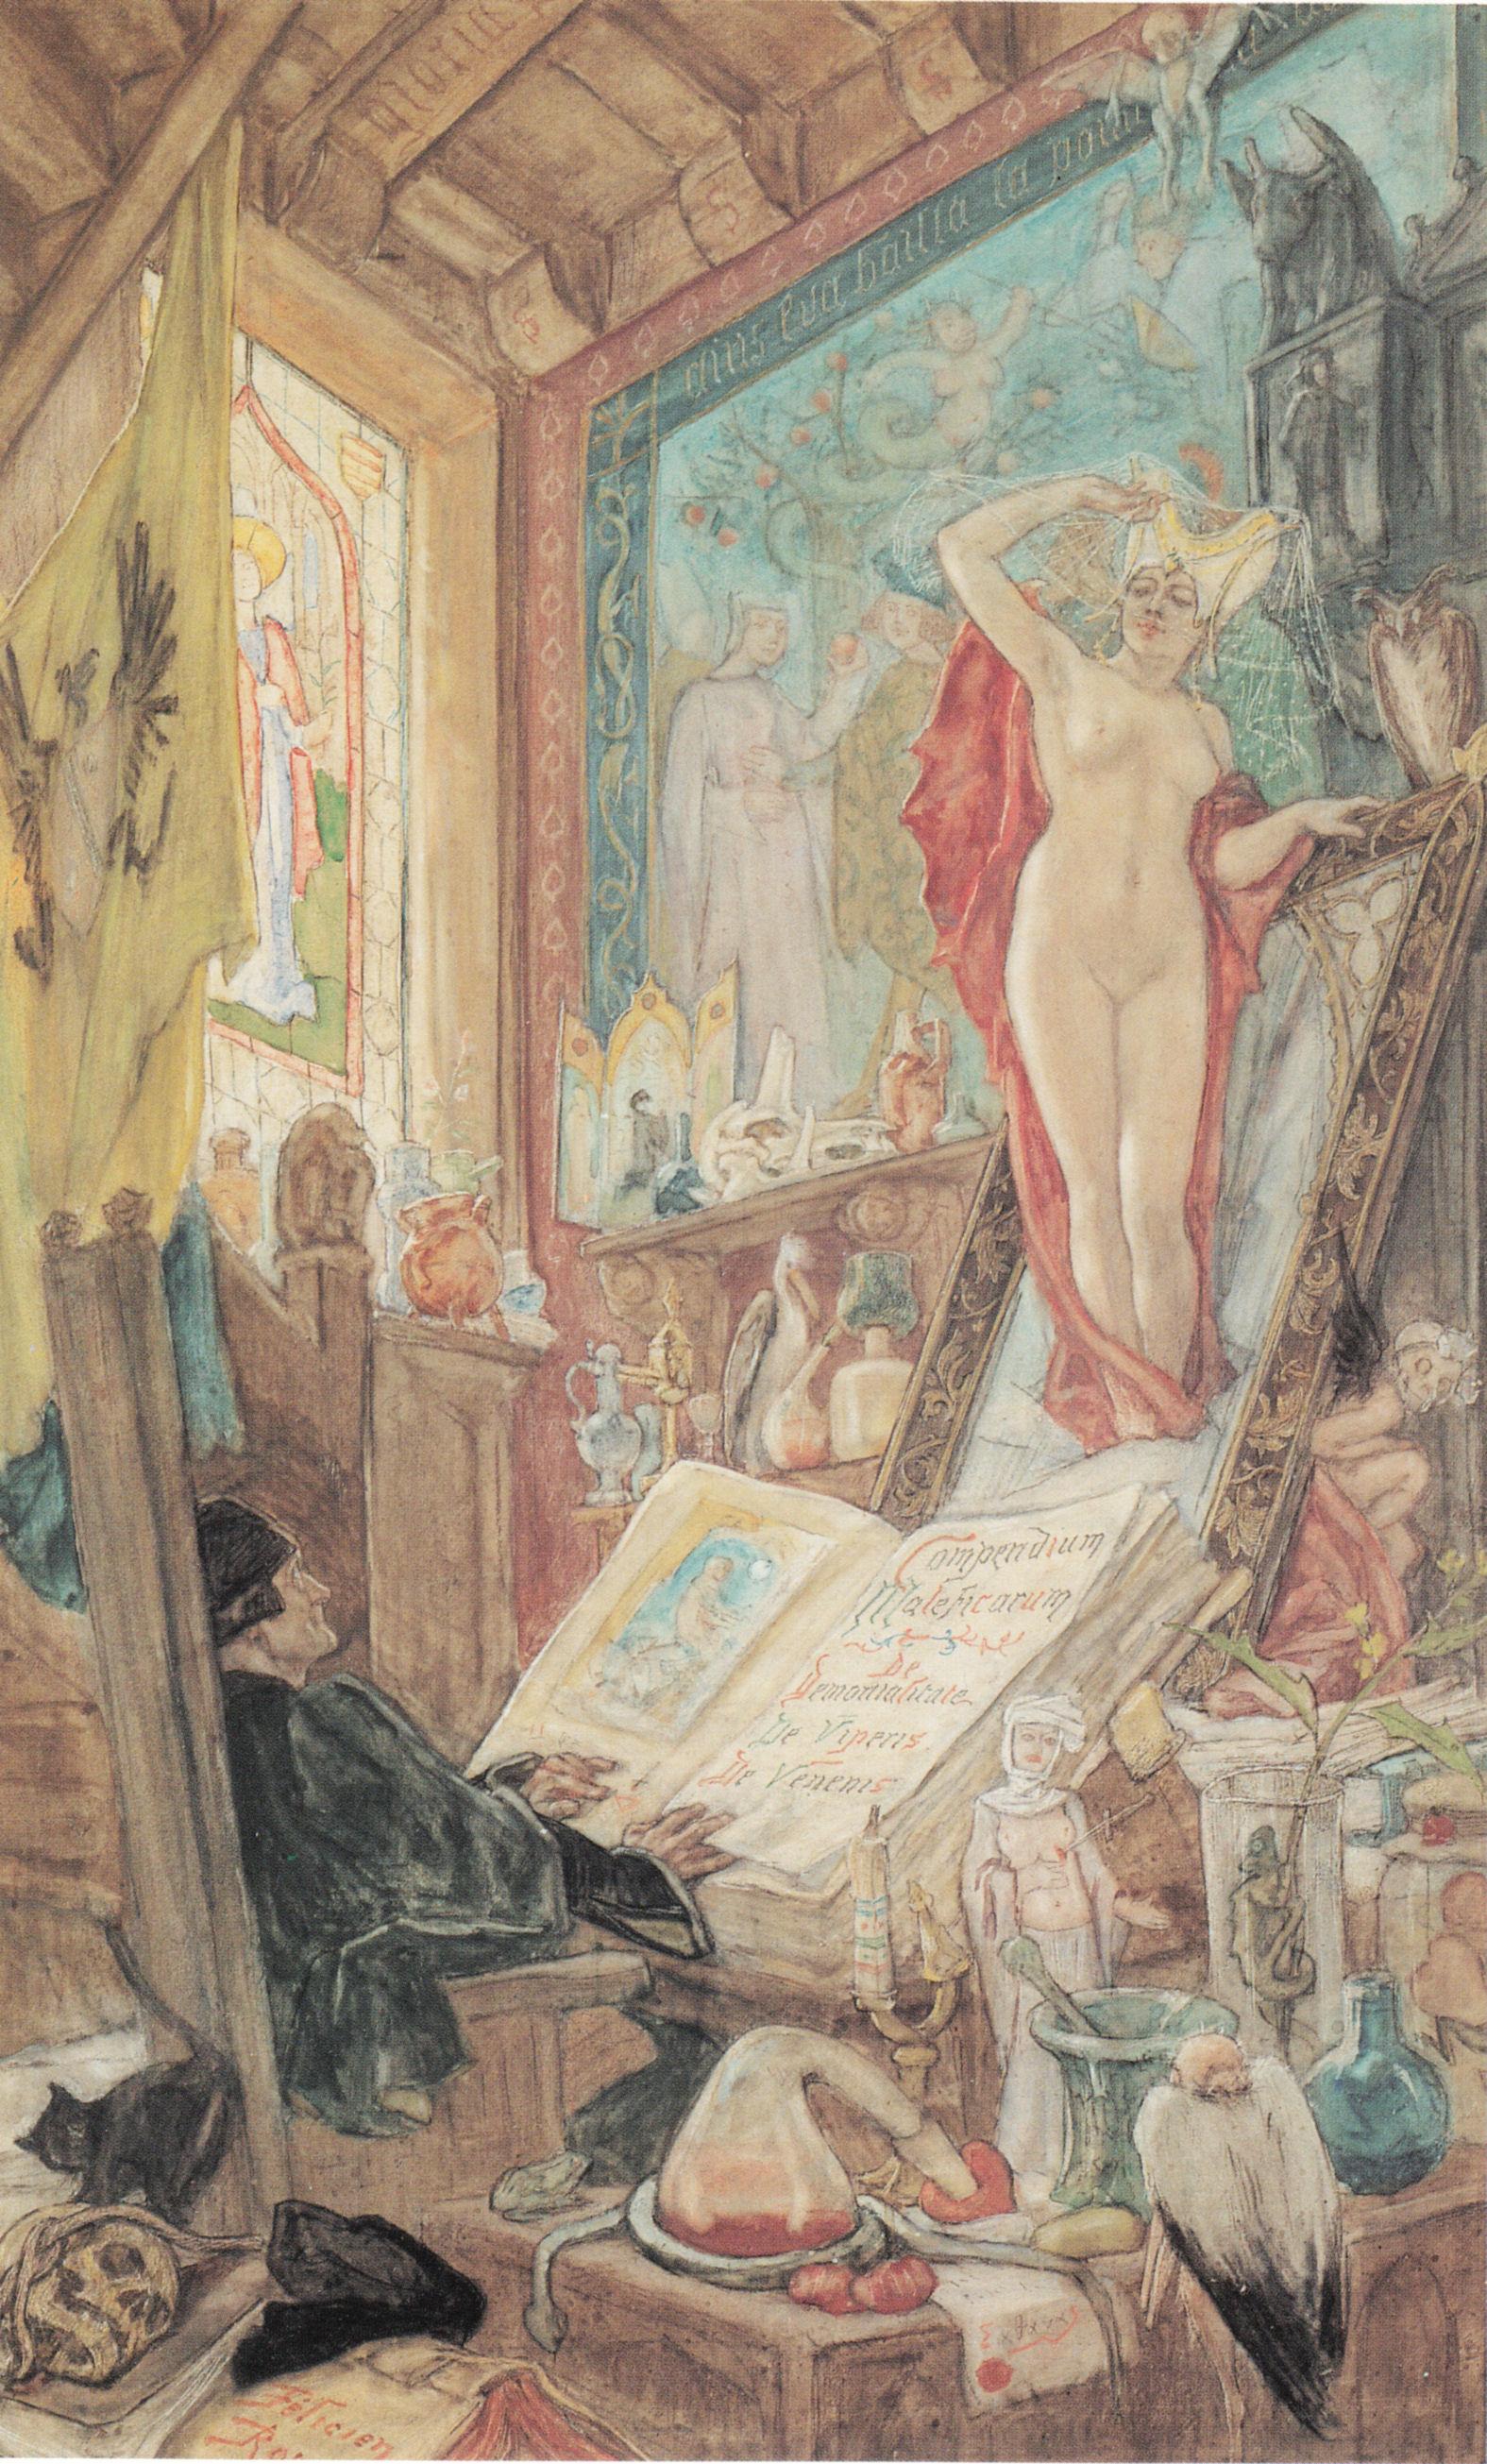 Incantation, 1885